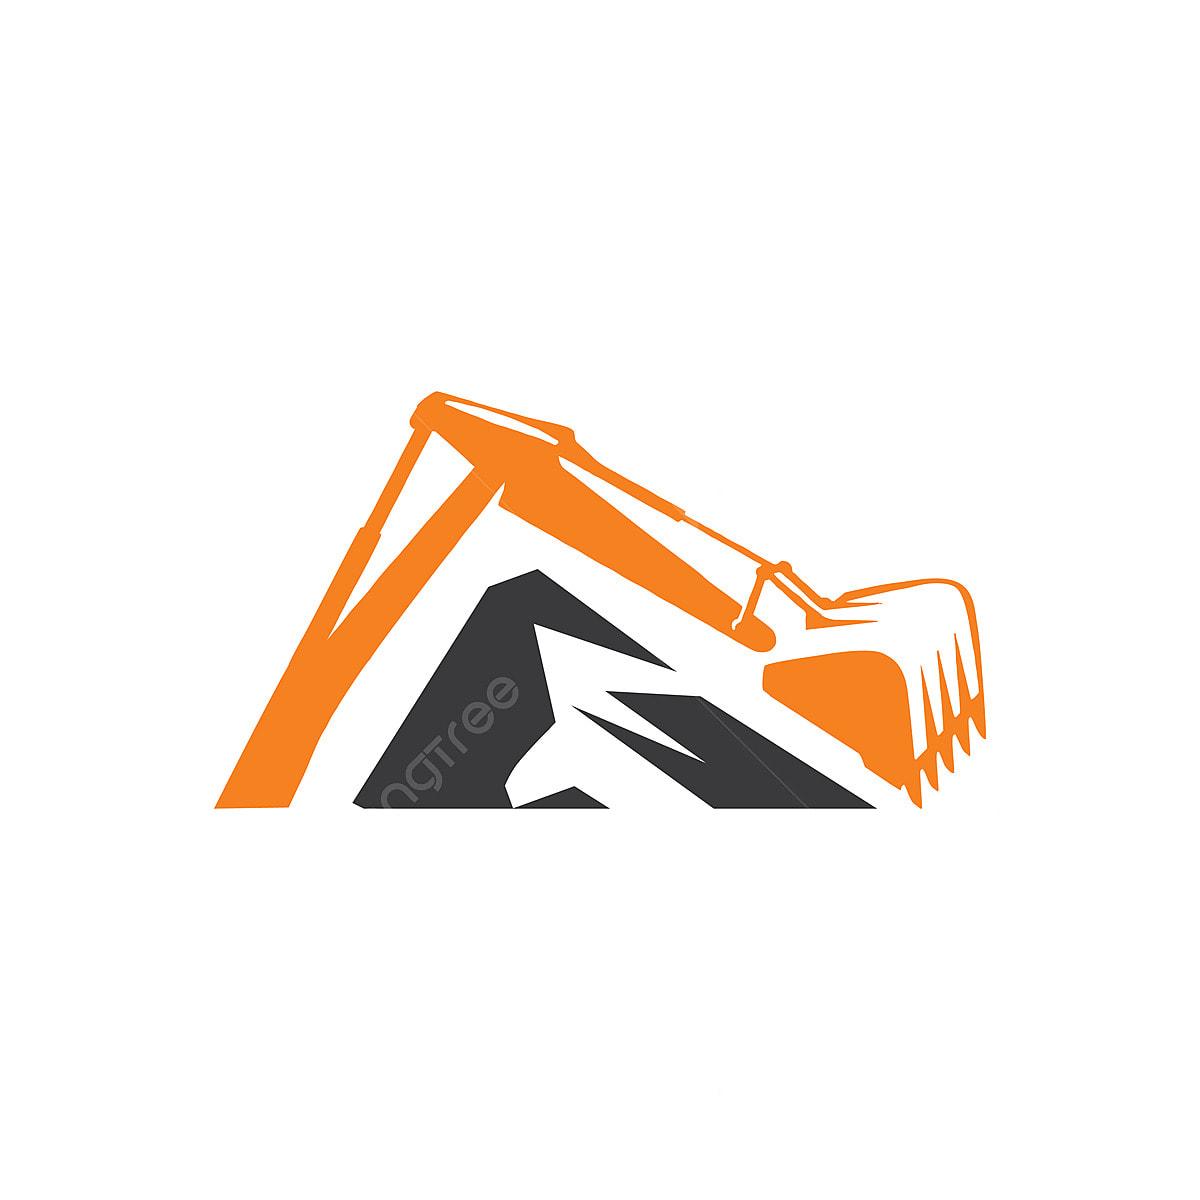 Excavator Logo Vector Symbol Illustration Transport Png And Vector With Transparent Background For Free Download